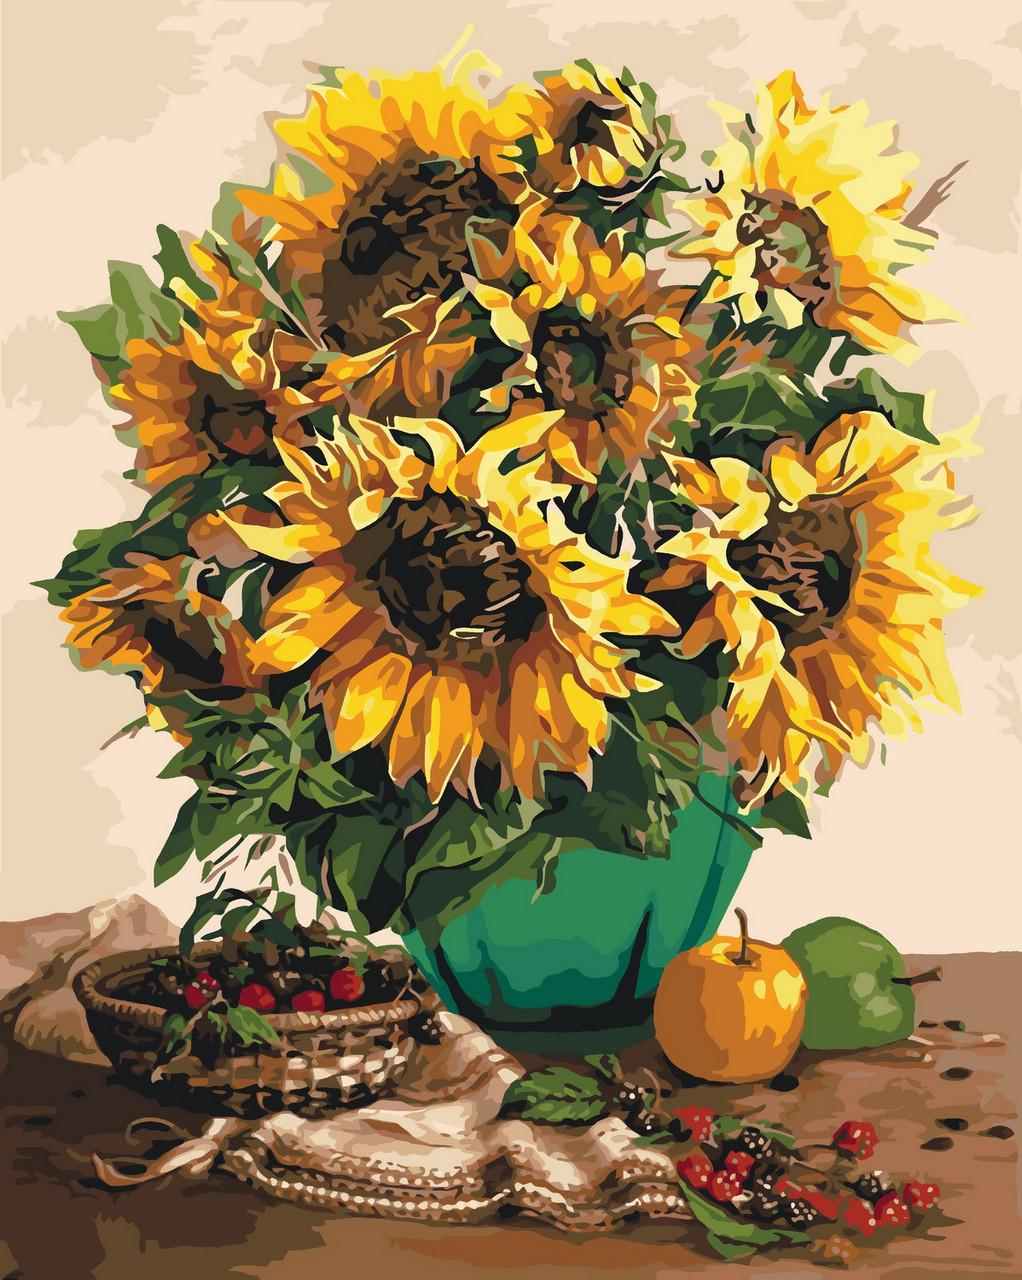 Картина по номерам Подсолнухи и осенние фрукты 40 х 50 см (KHO3019)